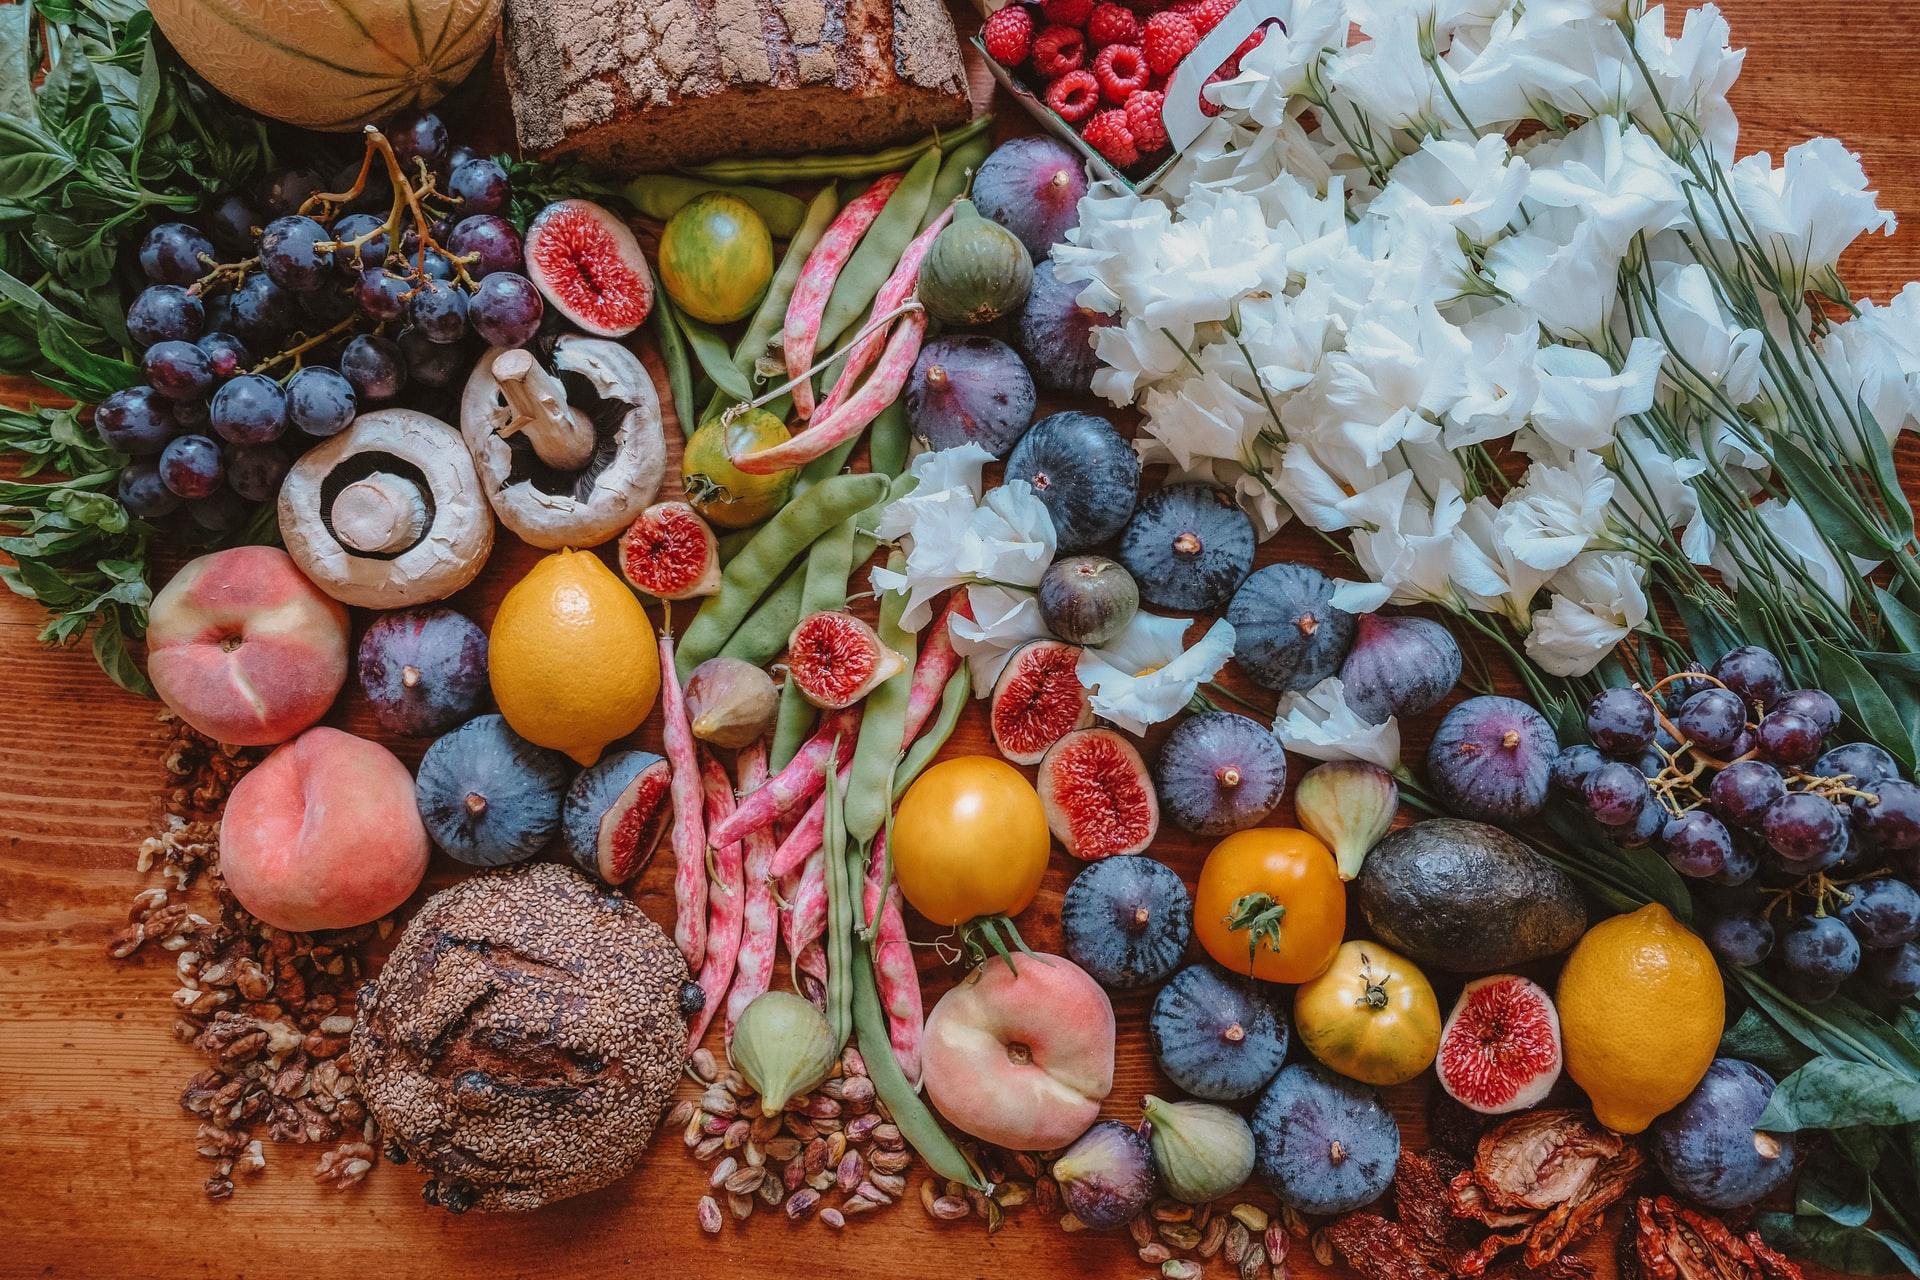 intestino irritabile, prova la dieta brat